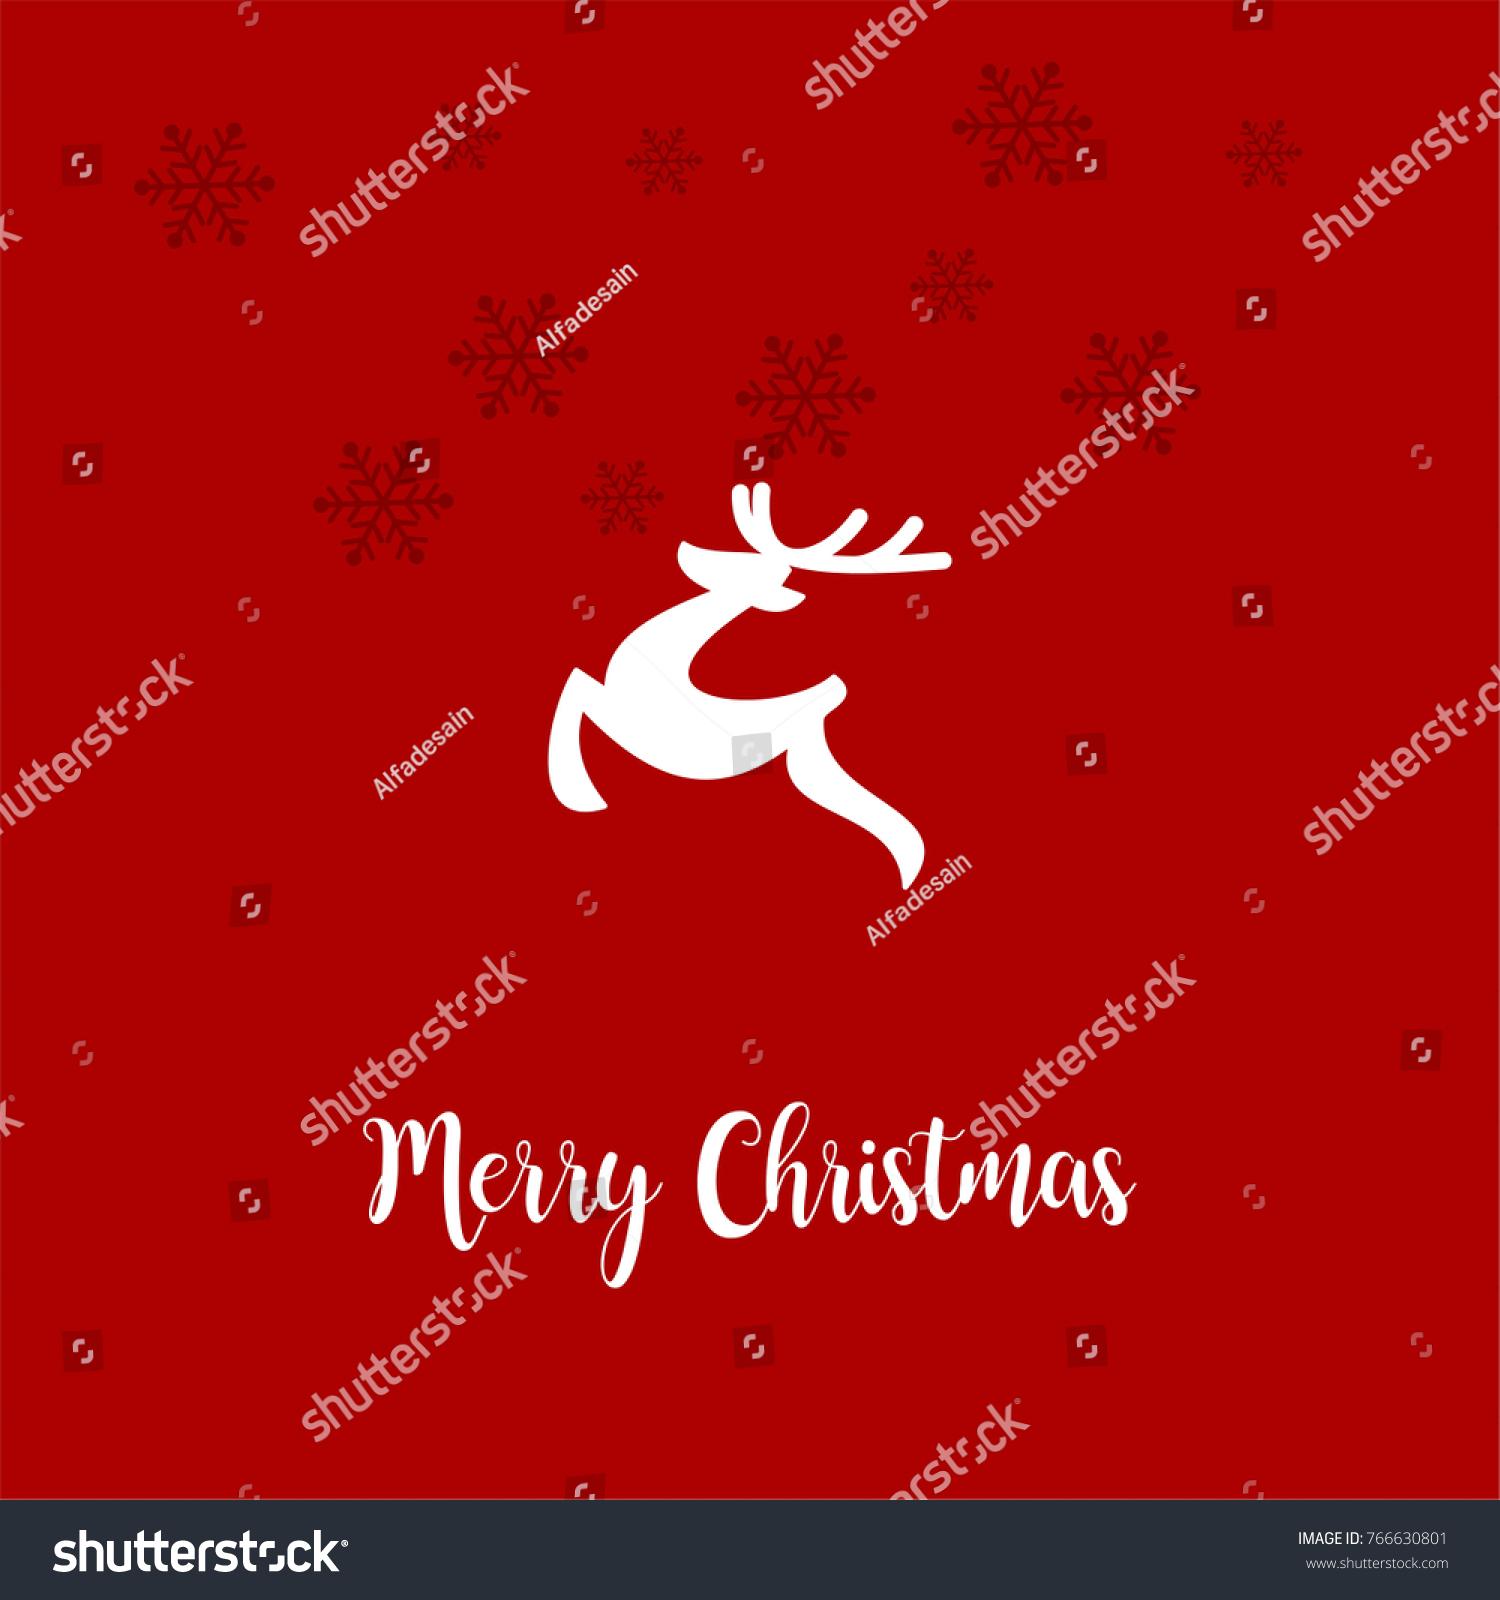 Christmas Card Designs Vector Stock Vector 766630801 Shutterstock